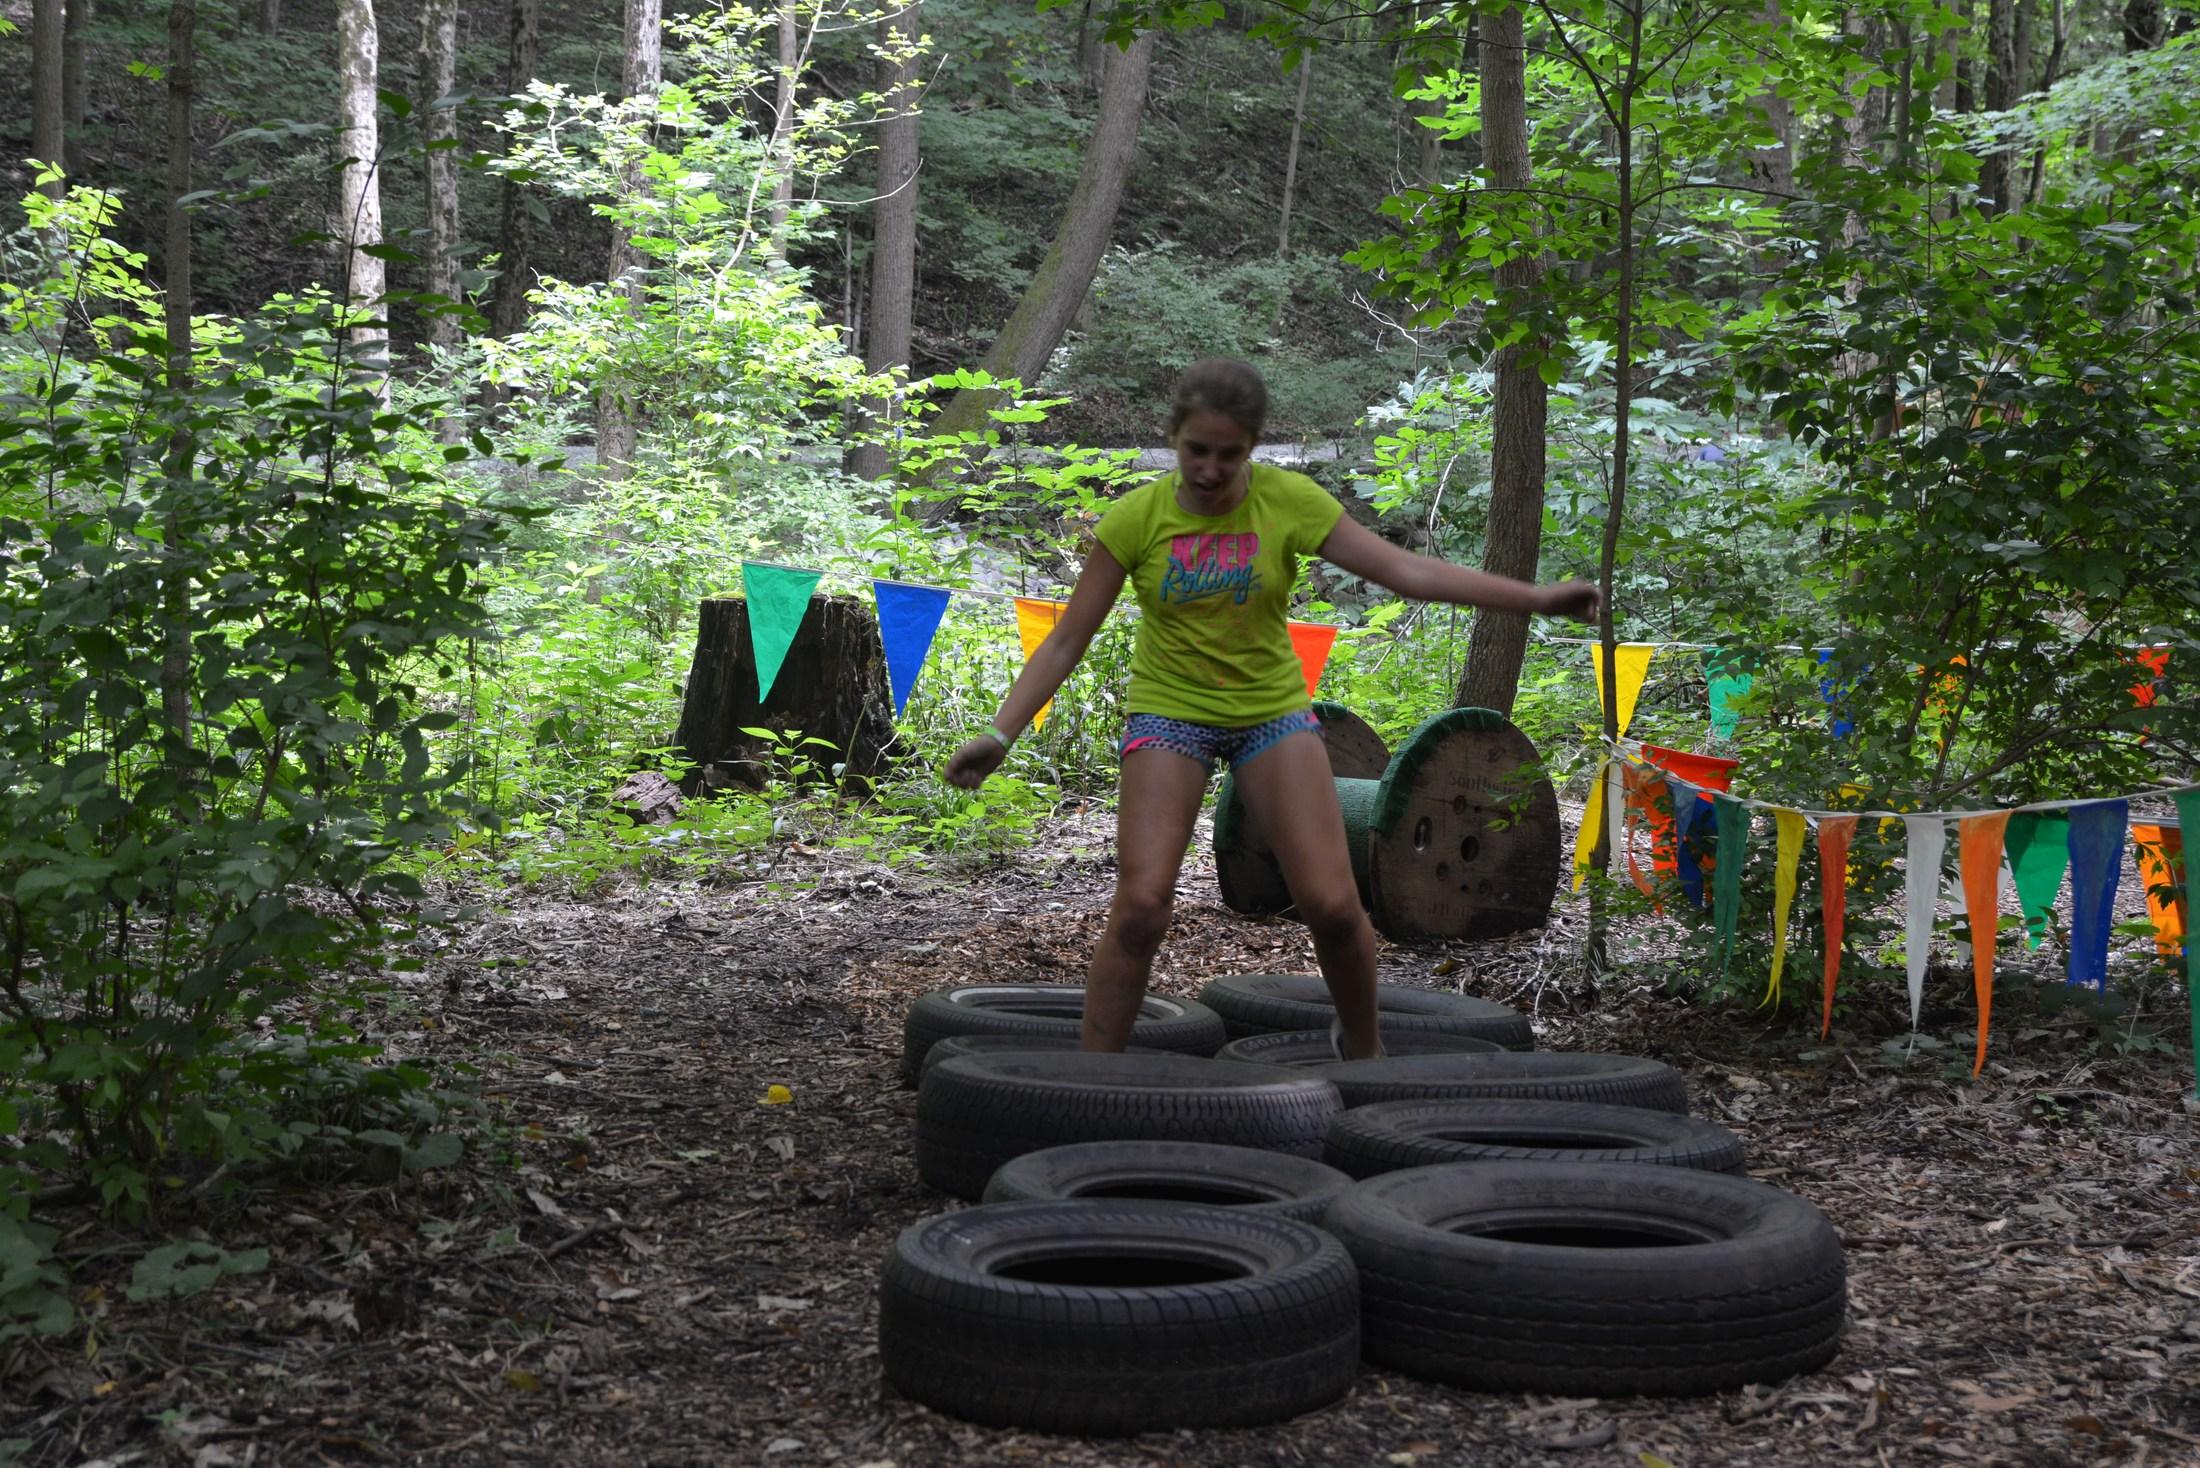 Female student jumping through tires at Camp Willard